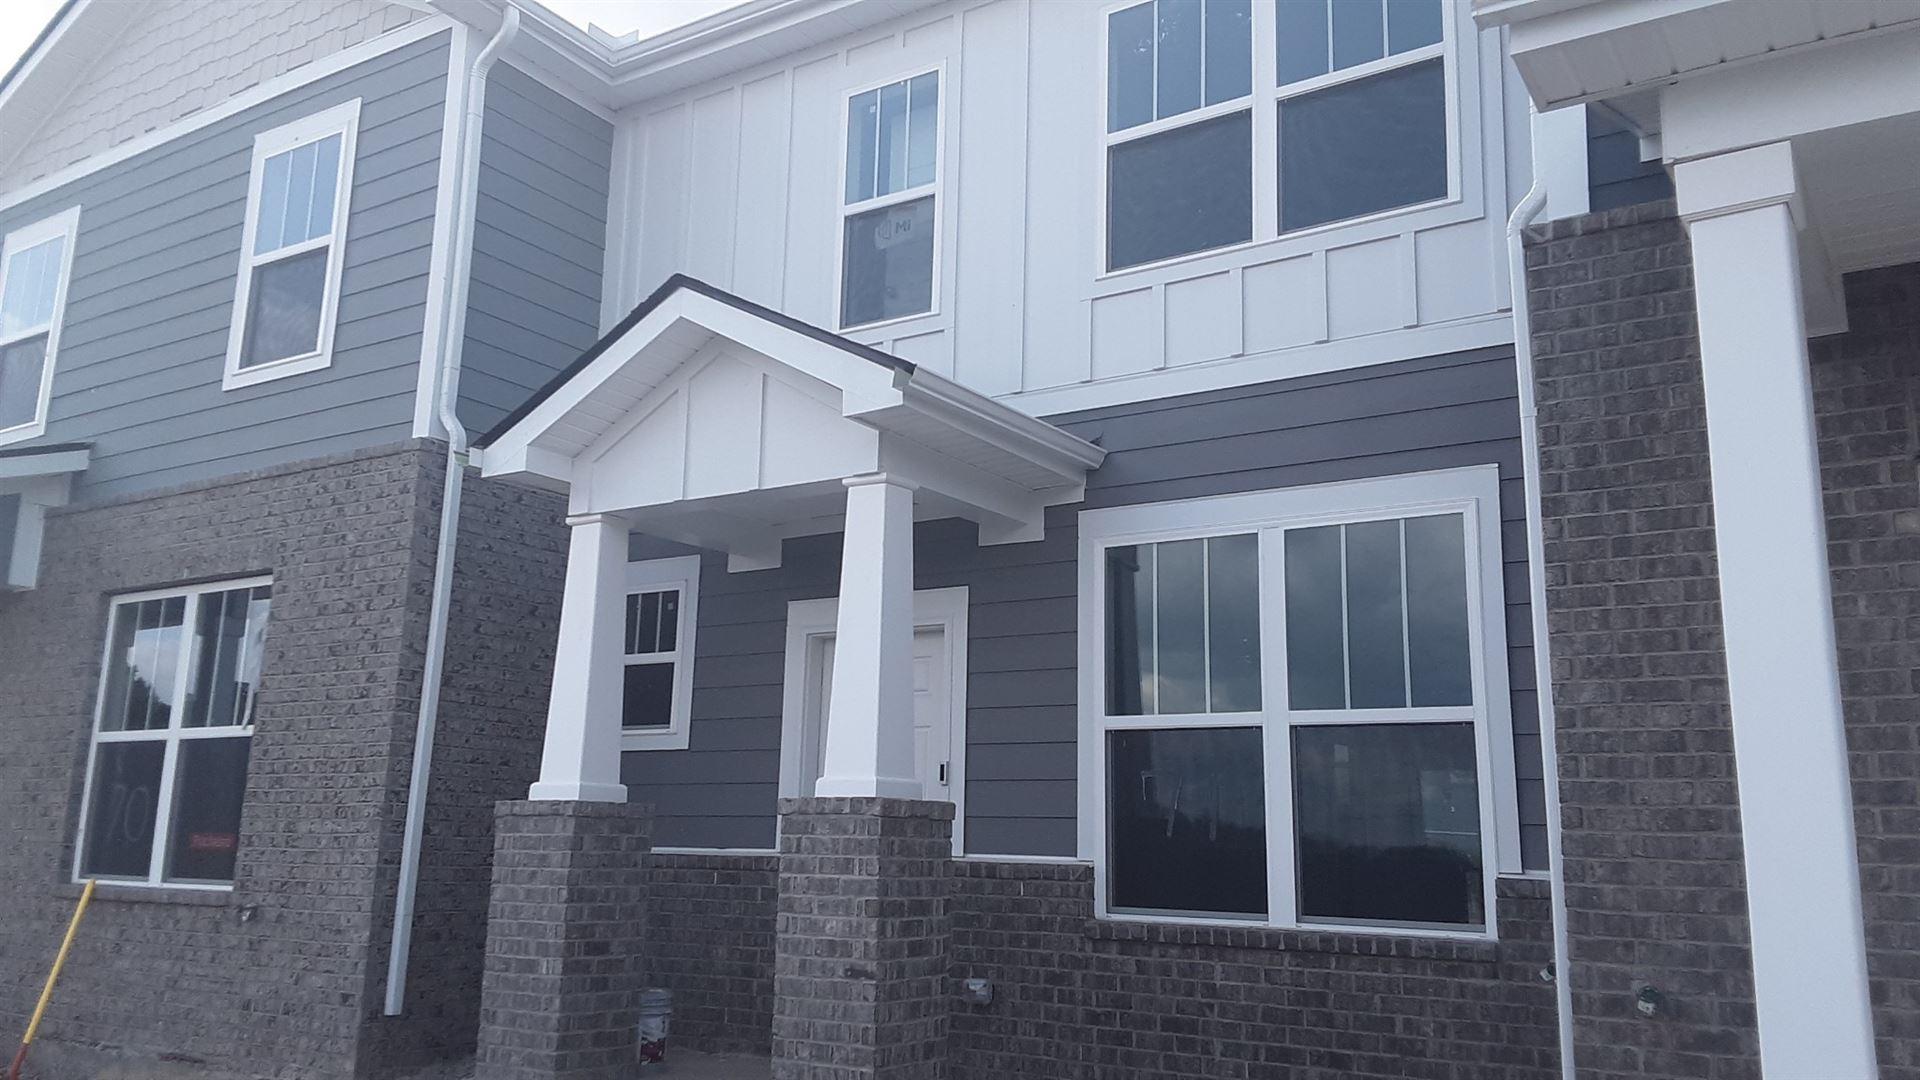 1607 Tolkien Lane, Murfreesboro, TN 37128 - MLS#: 2197581